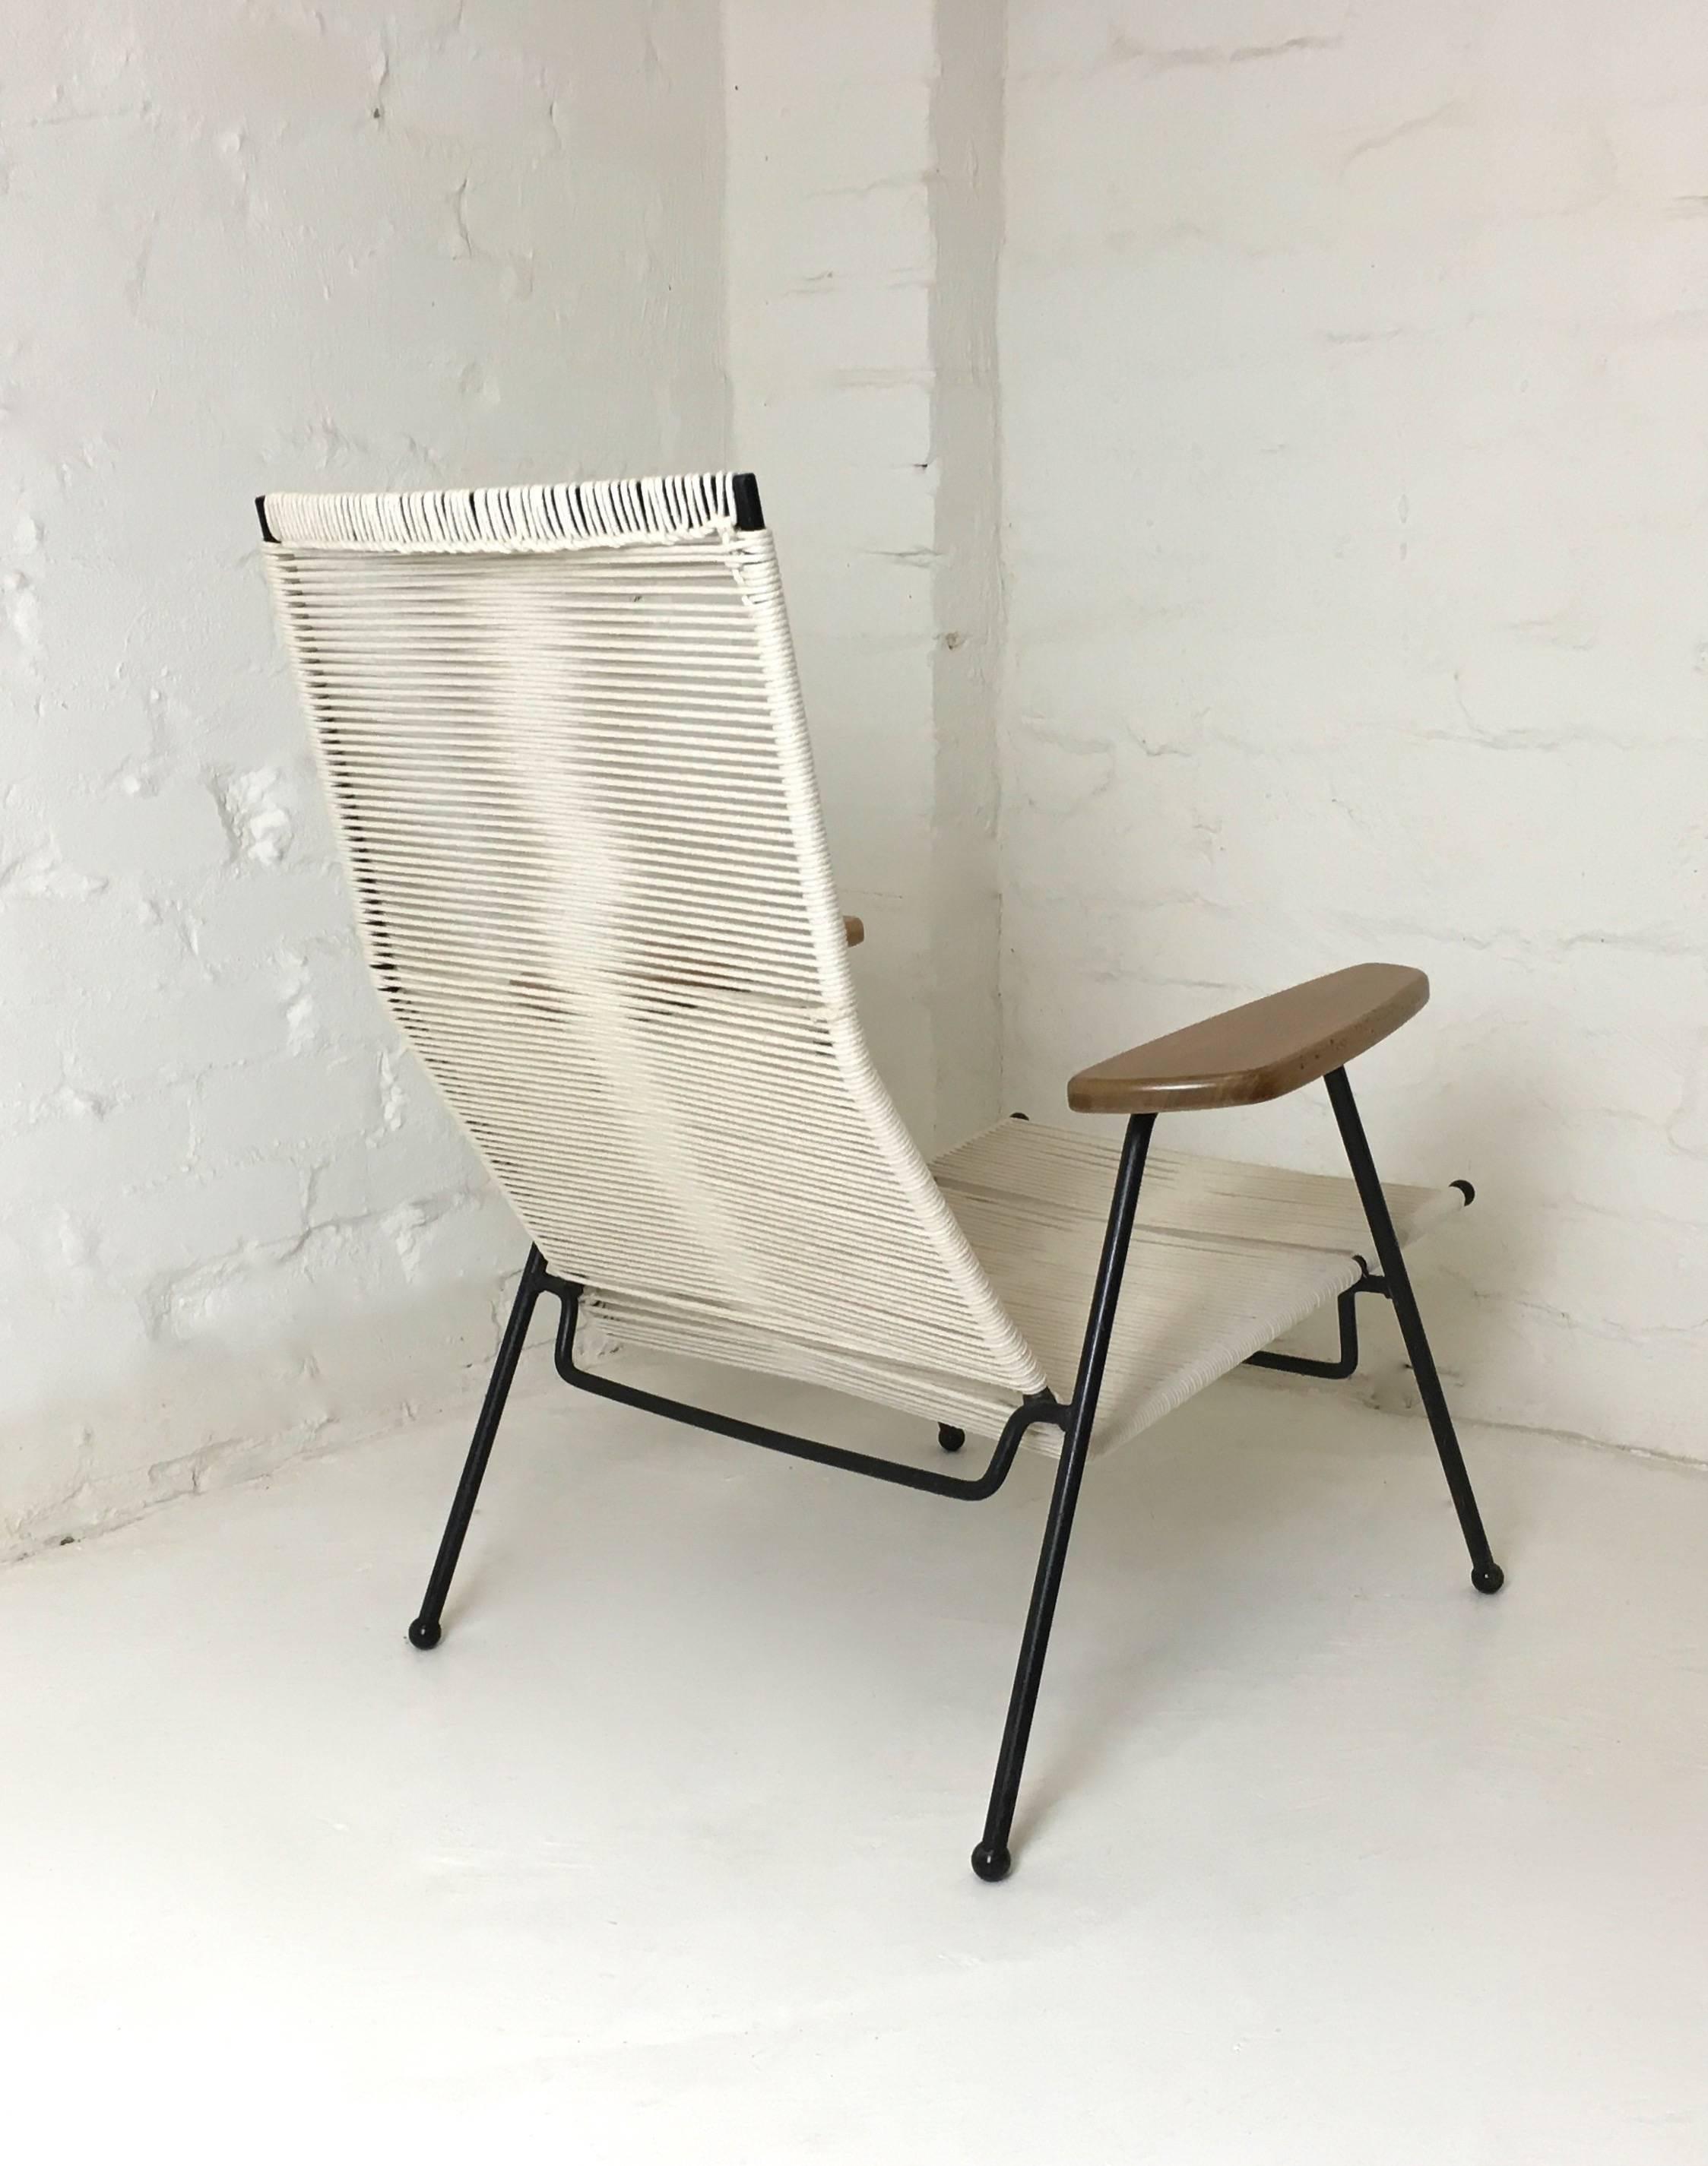 Mid Century Modern Calypso String Chair By Bernard Goss For Pandar,  Melbourne, 1956